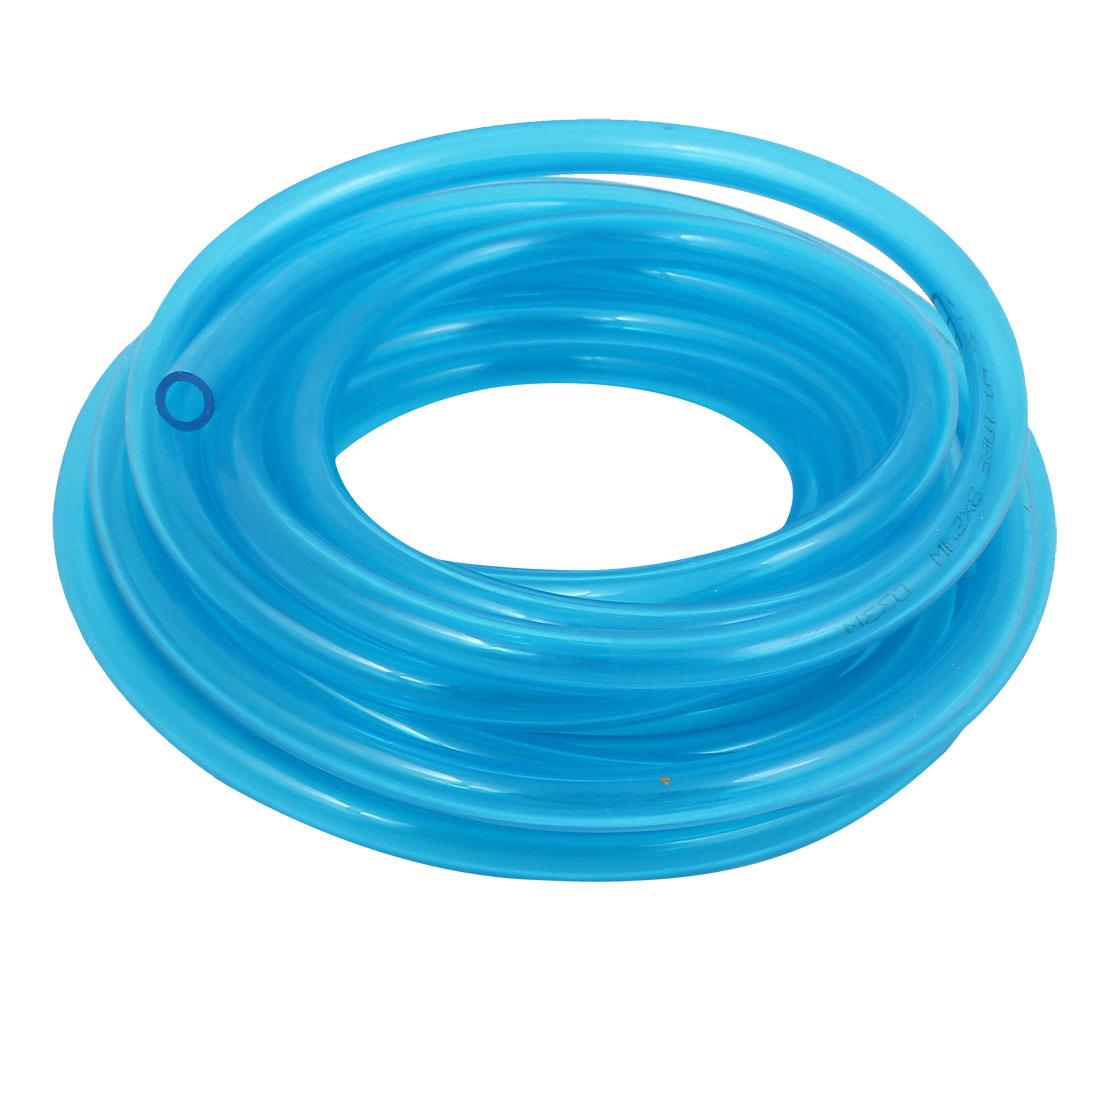 3.8M 12.5Ft 8mm x 5mm Polyurethane PU Hose Pipe Air Tube Hose Clear Blue